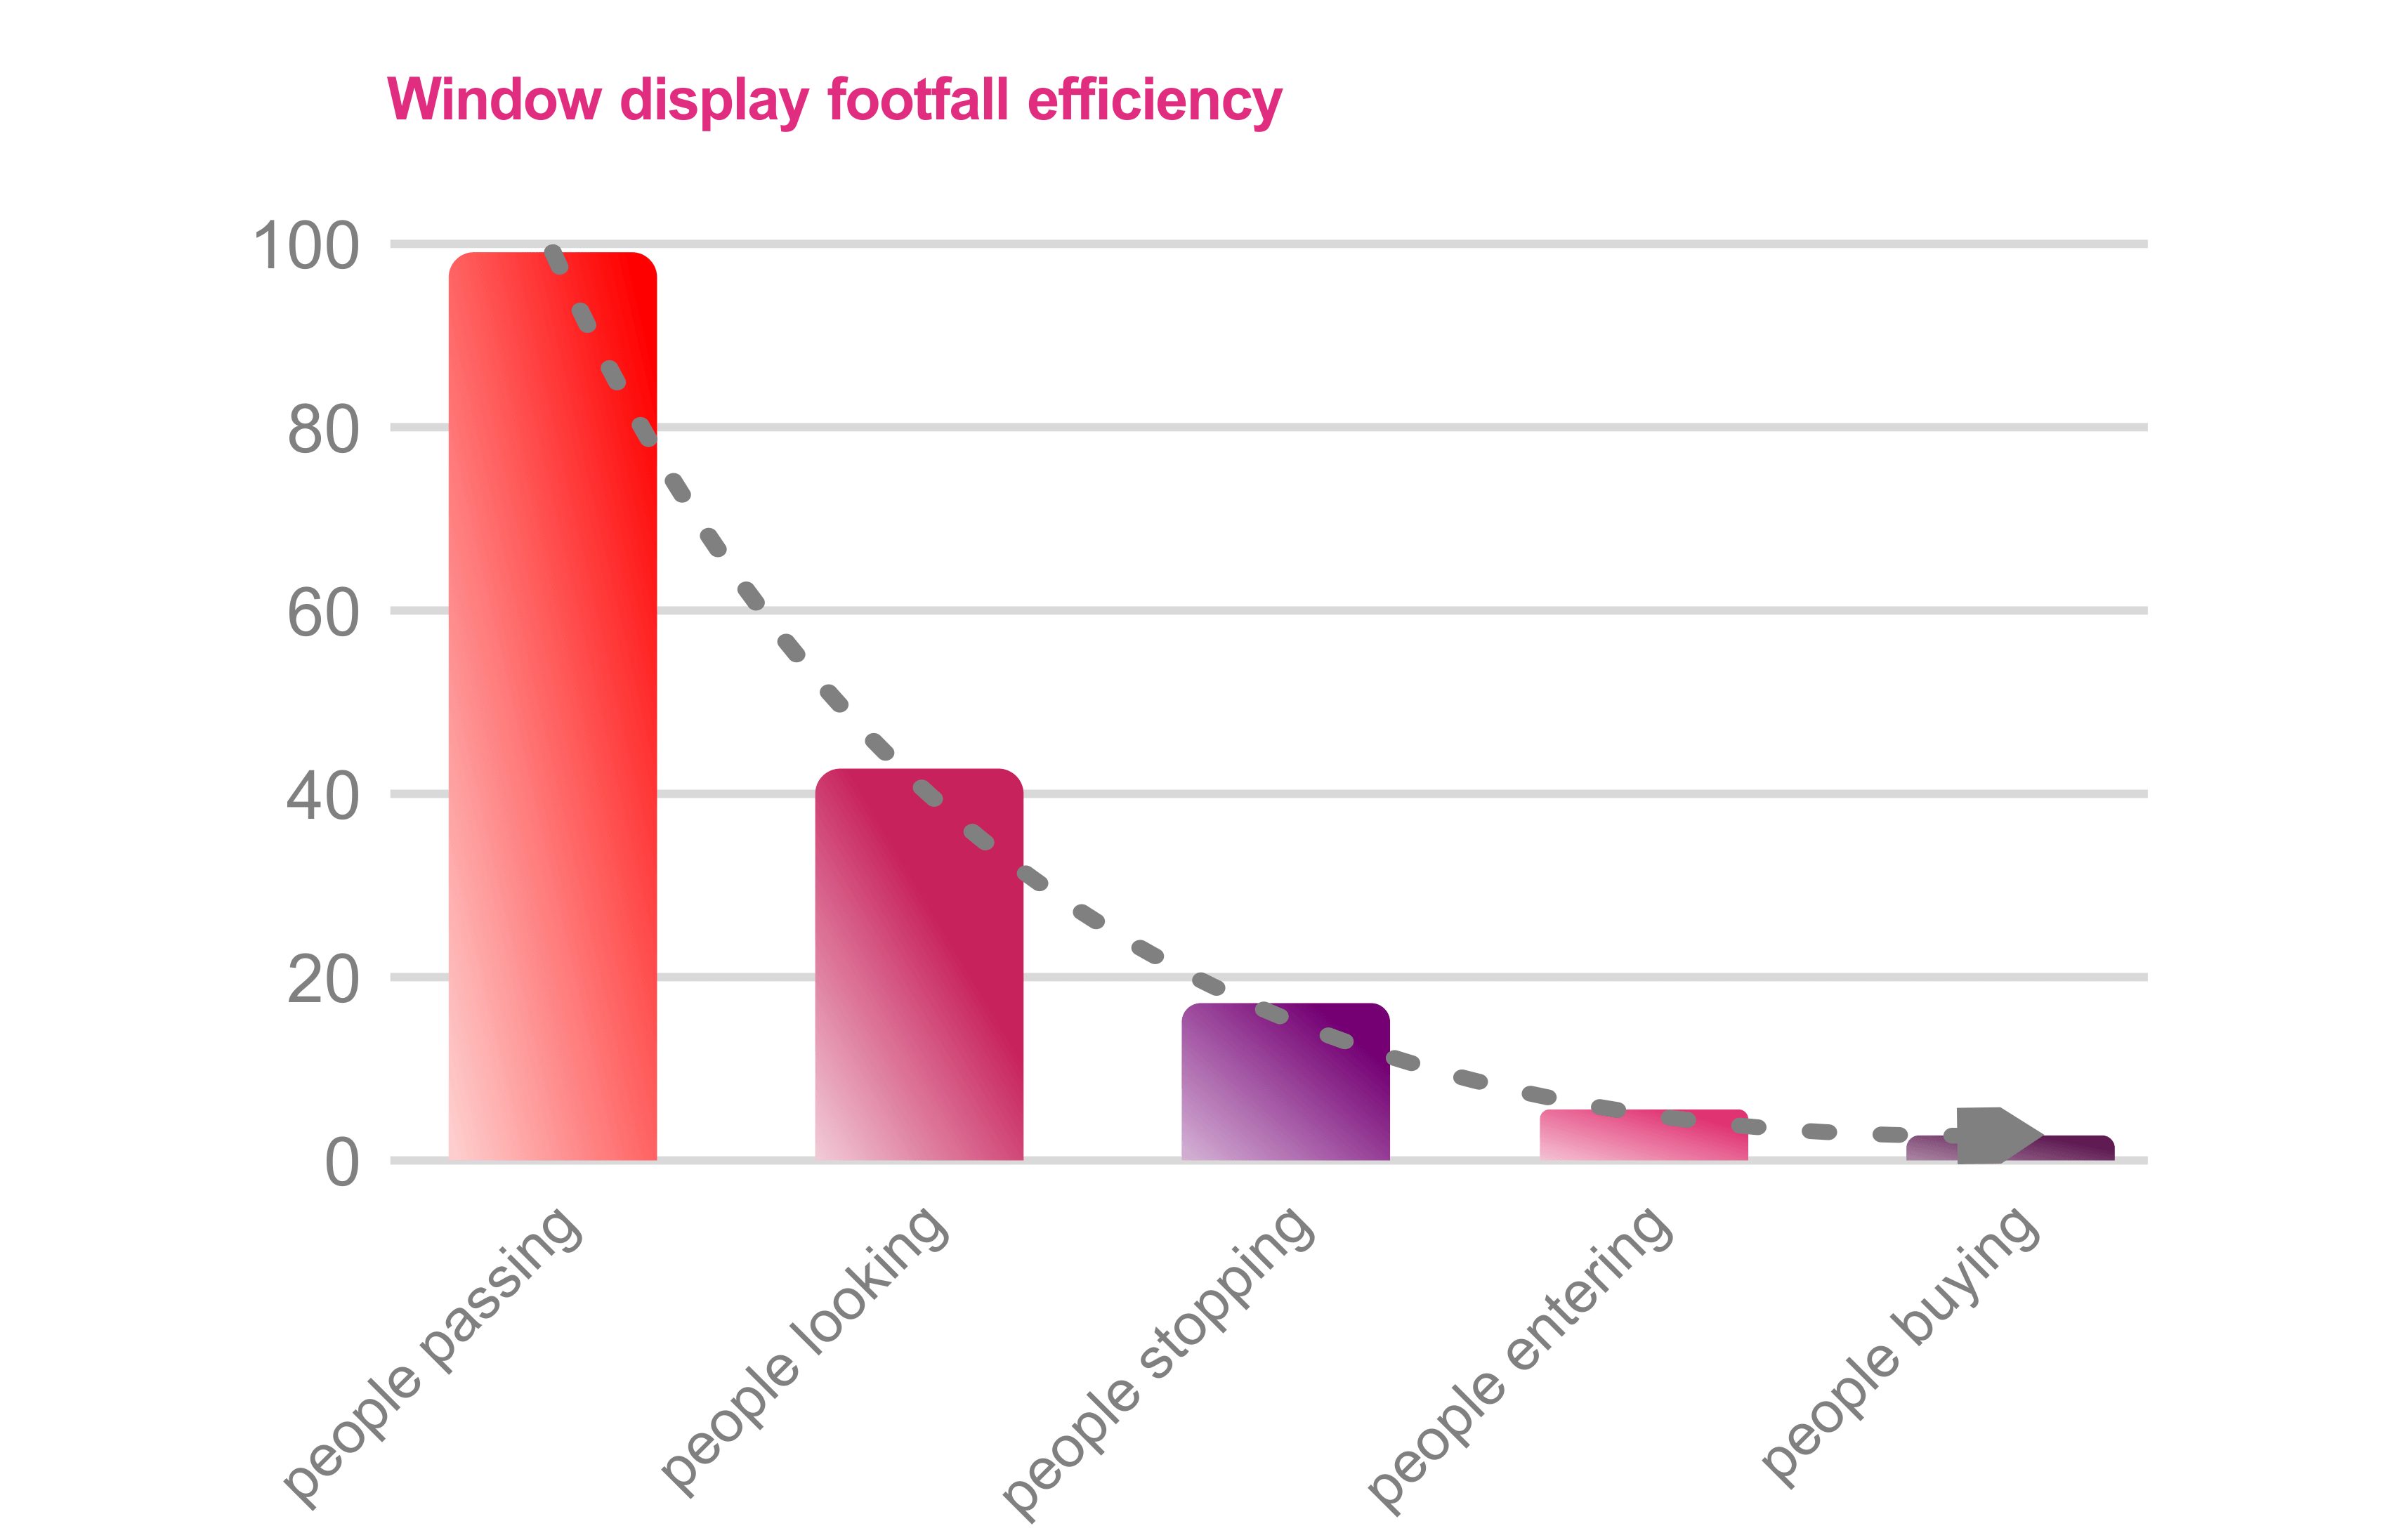 Retail window analysis results